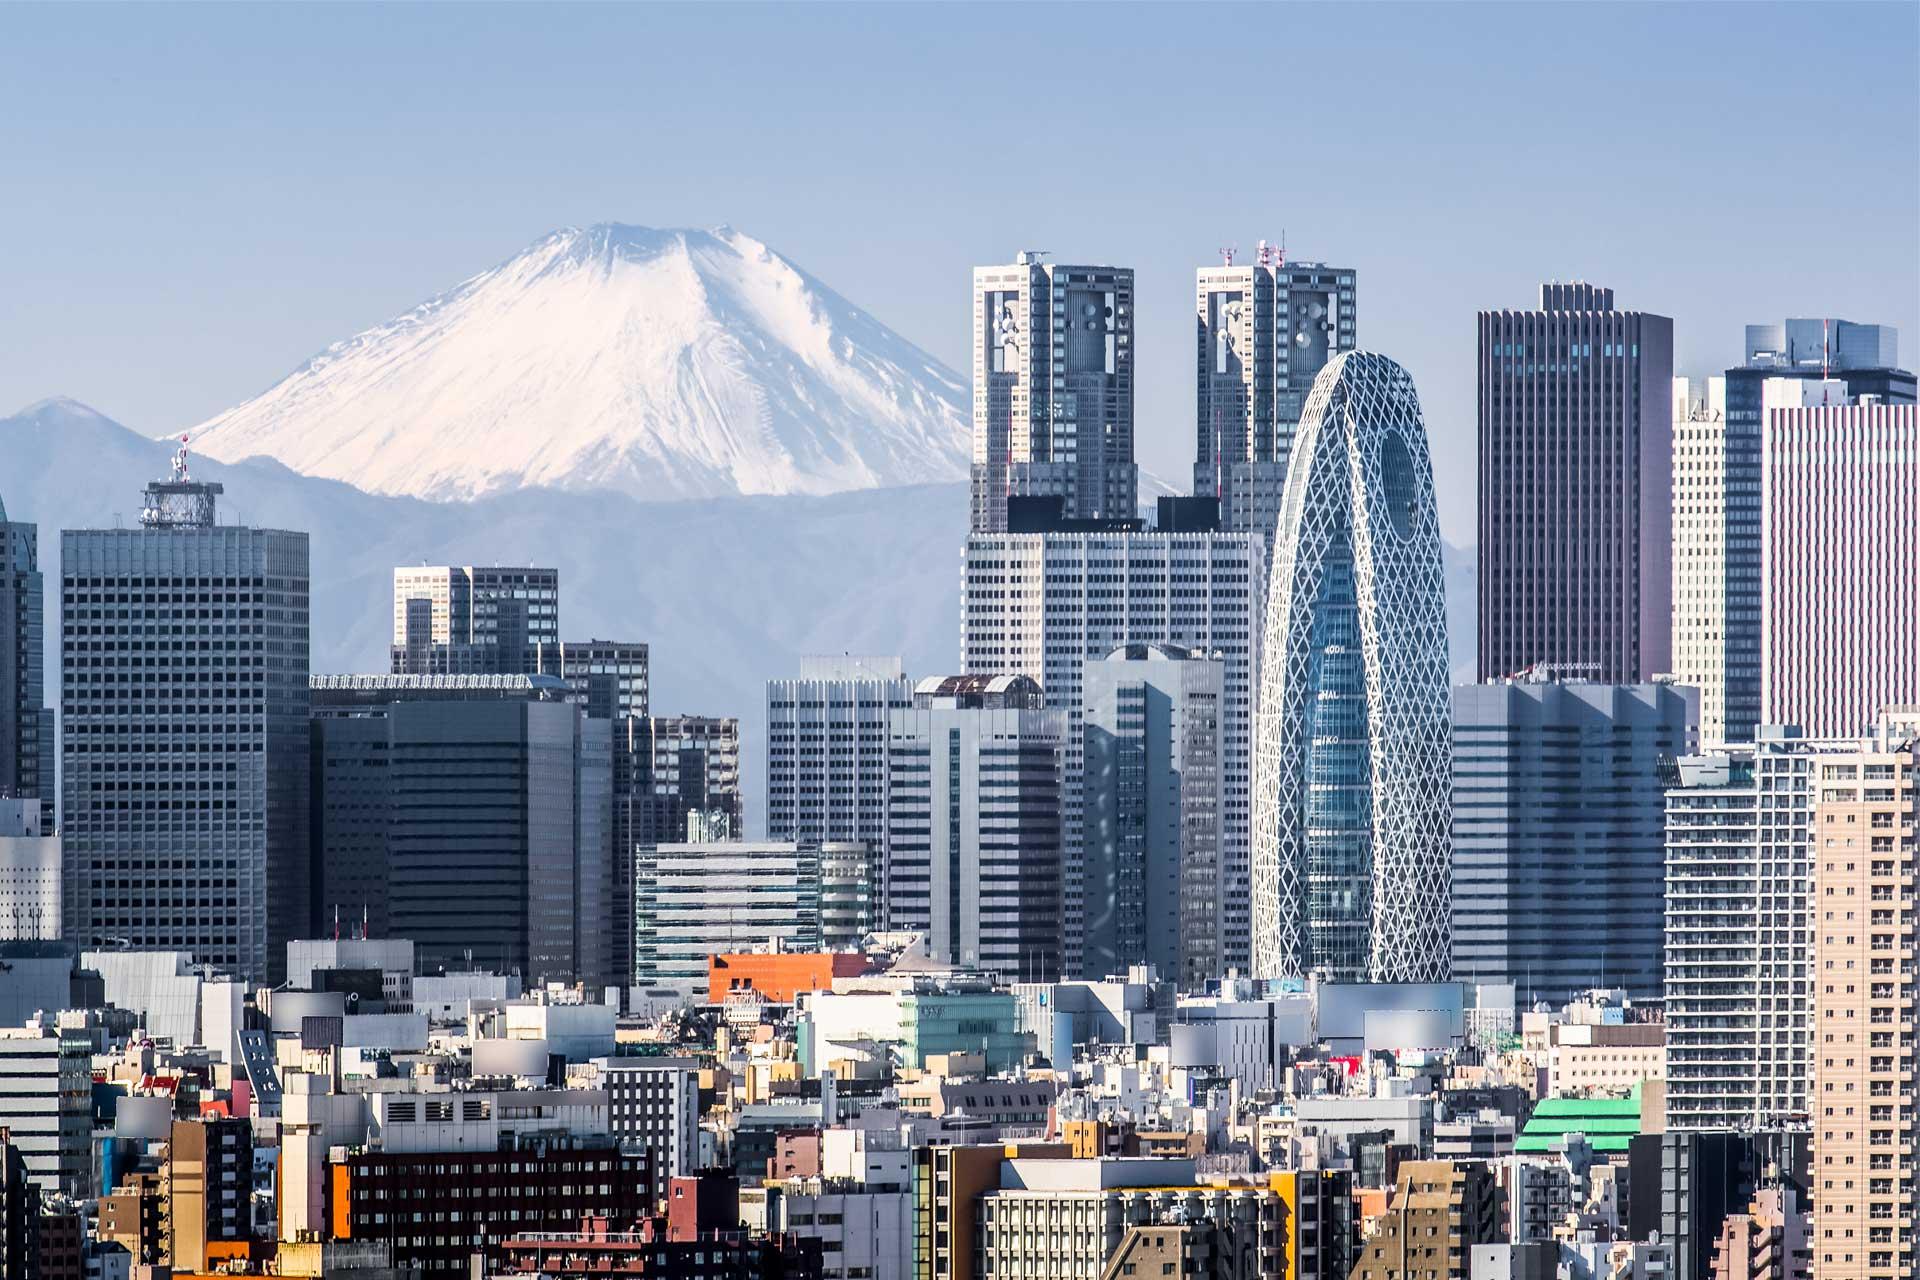 Exploreaza Tokyo un oras de poveste